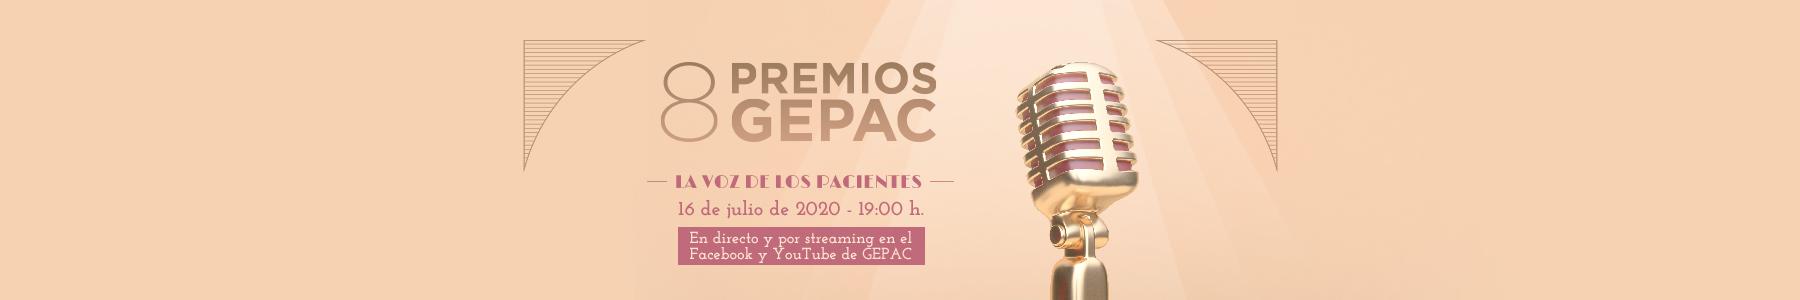 banner-aeal-8-premios-gepac-2020